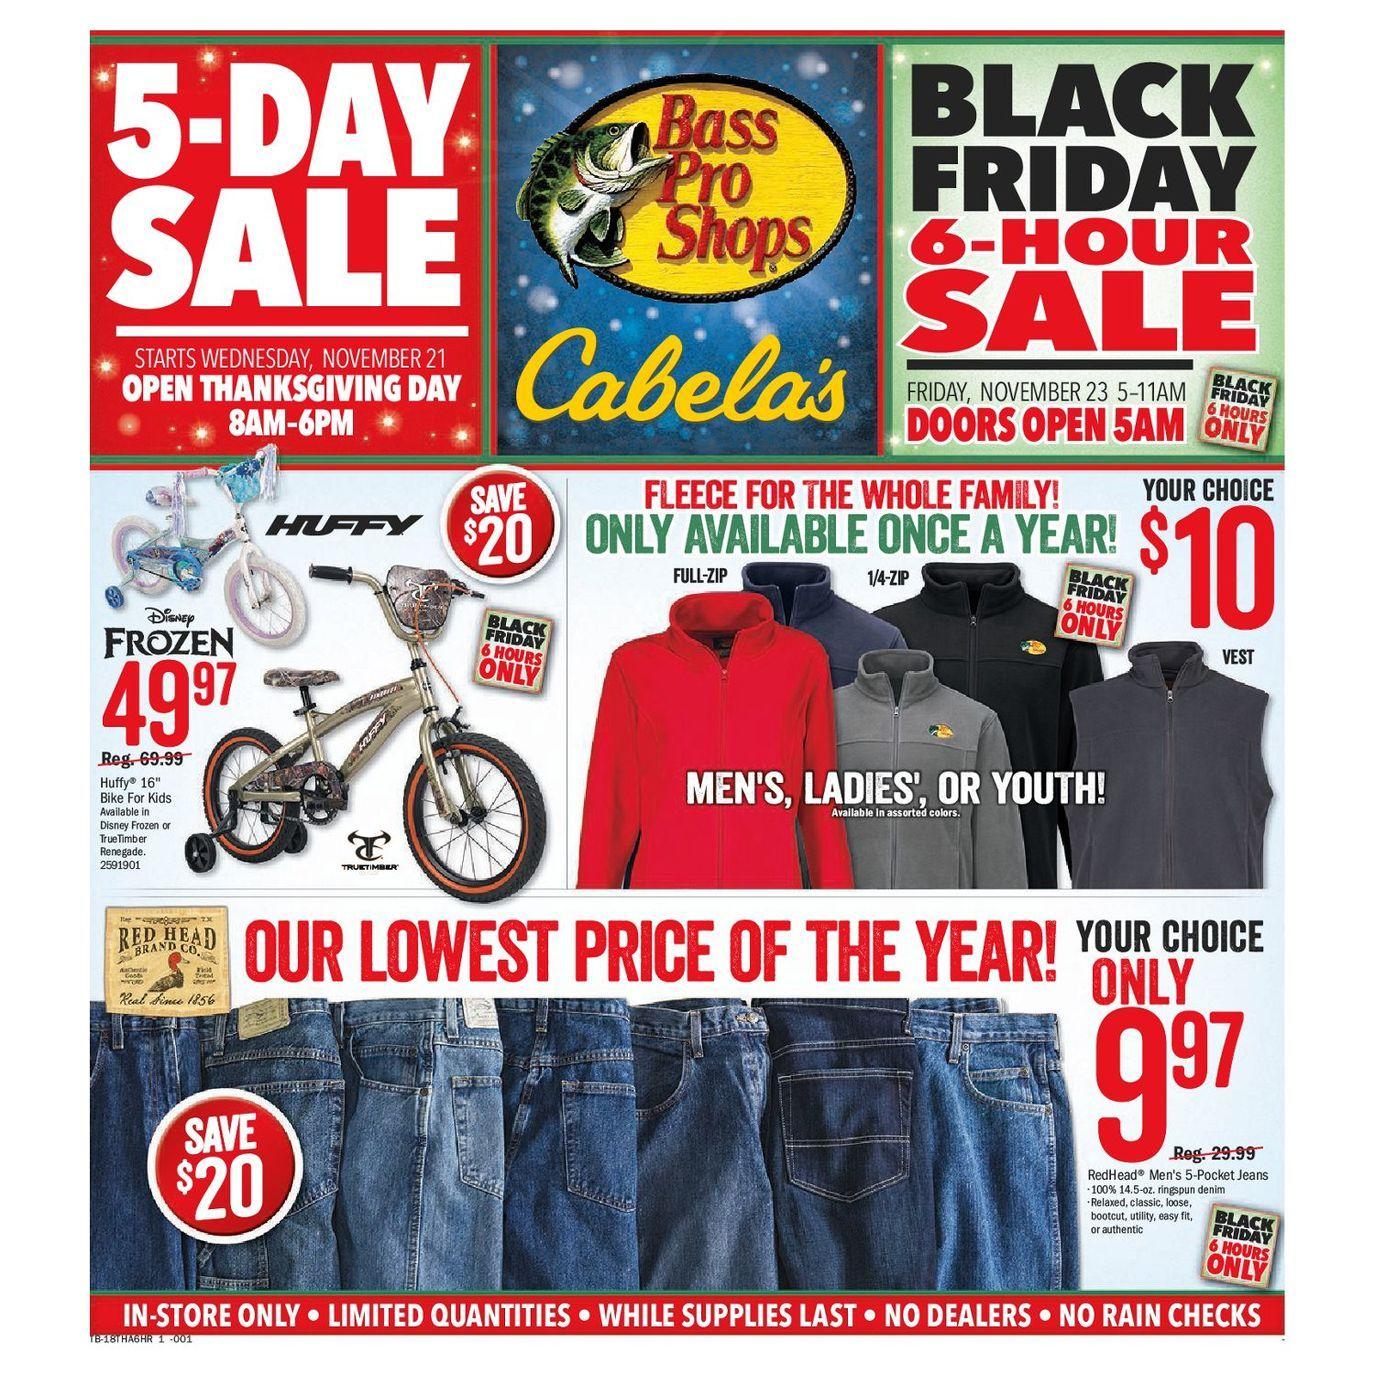 Bass Pro Shops 2019 Black Friday Ad Black Friday Ads Black Friday Shopping Black Friday